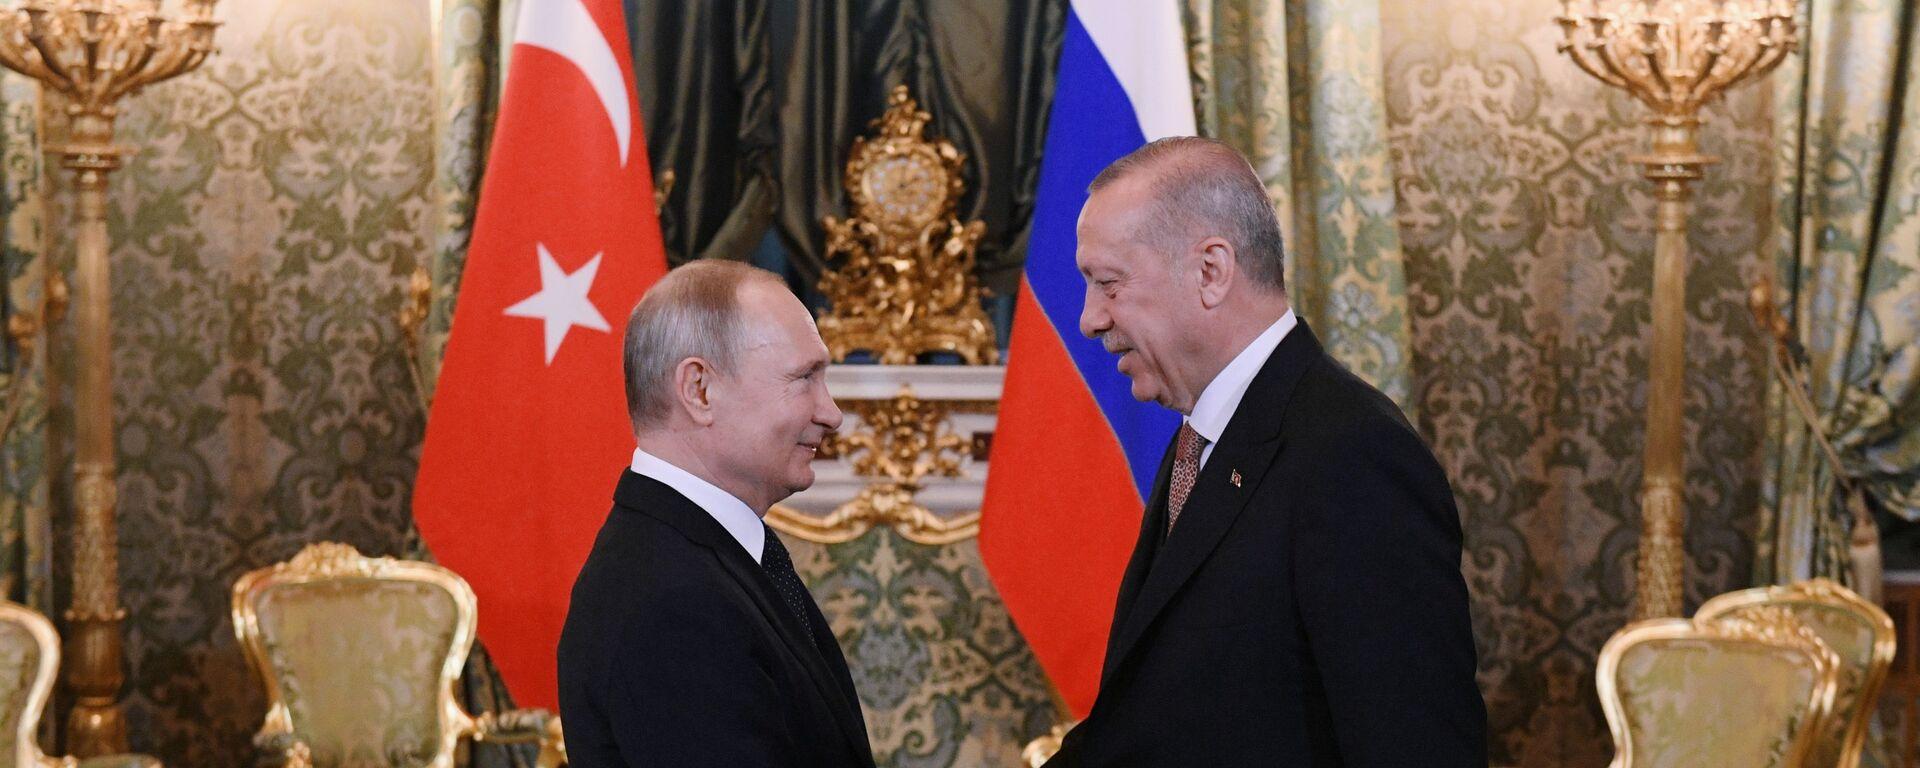 Президент РФ Владимир Путин и президент Турции Реджеп Тайип Эрдоган, фото из архива - Sputnik Азербайджан, 1920, 05.05.2021